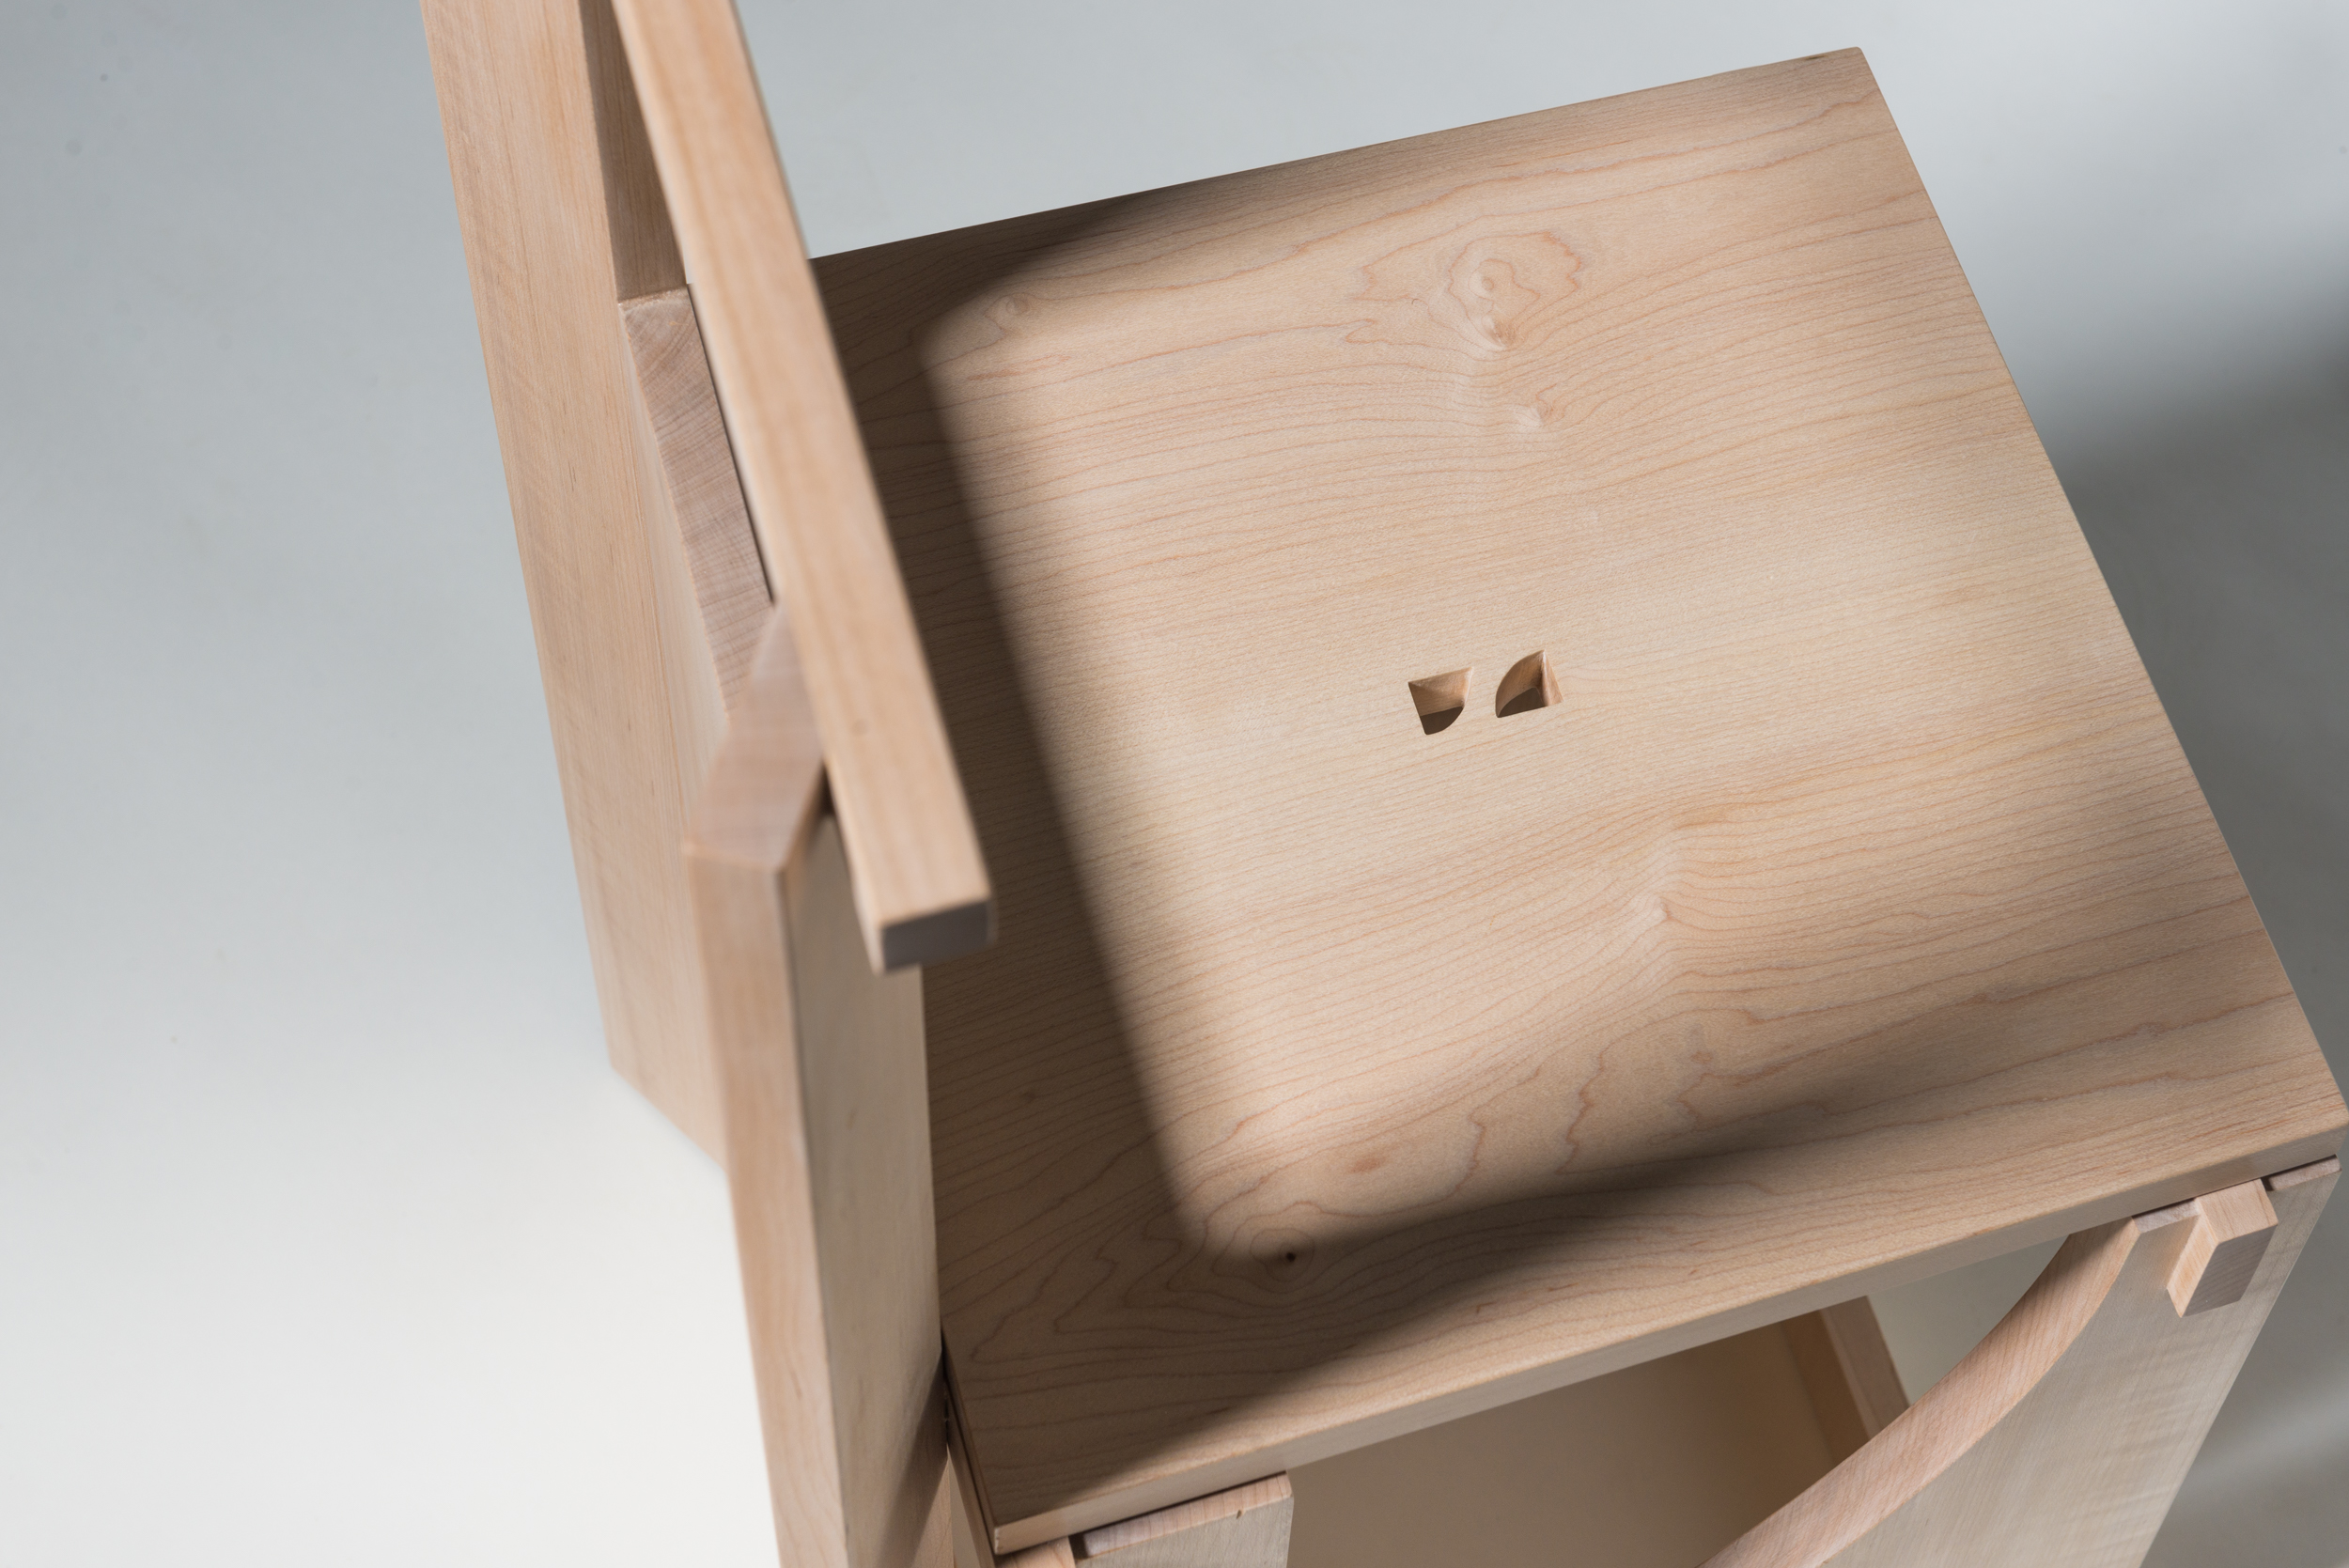 A detail shot of a chair design